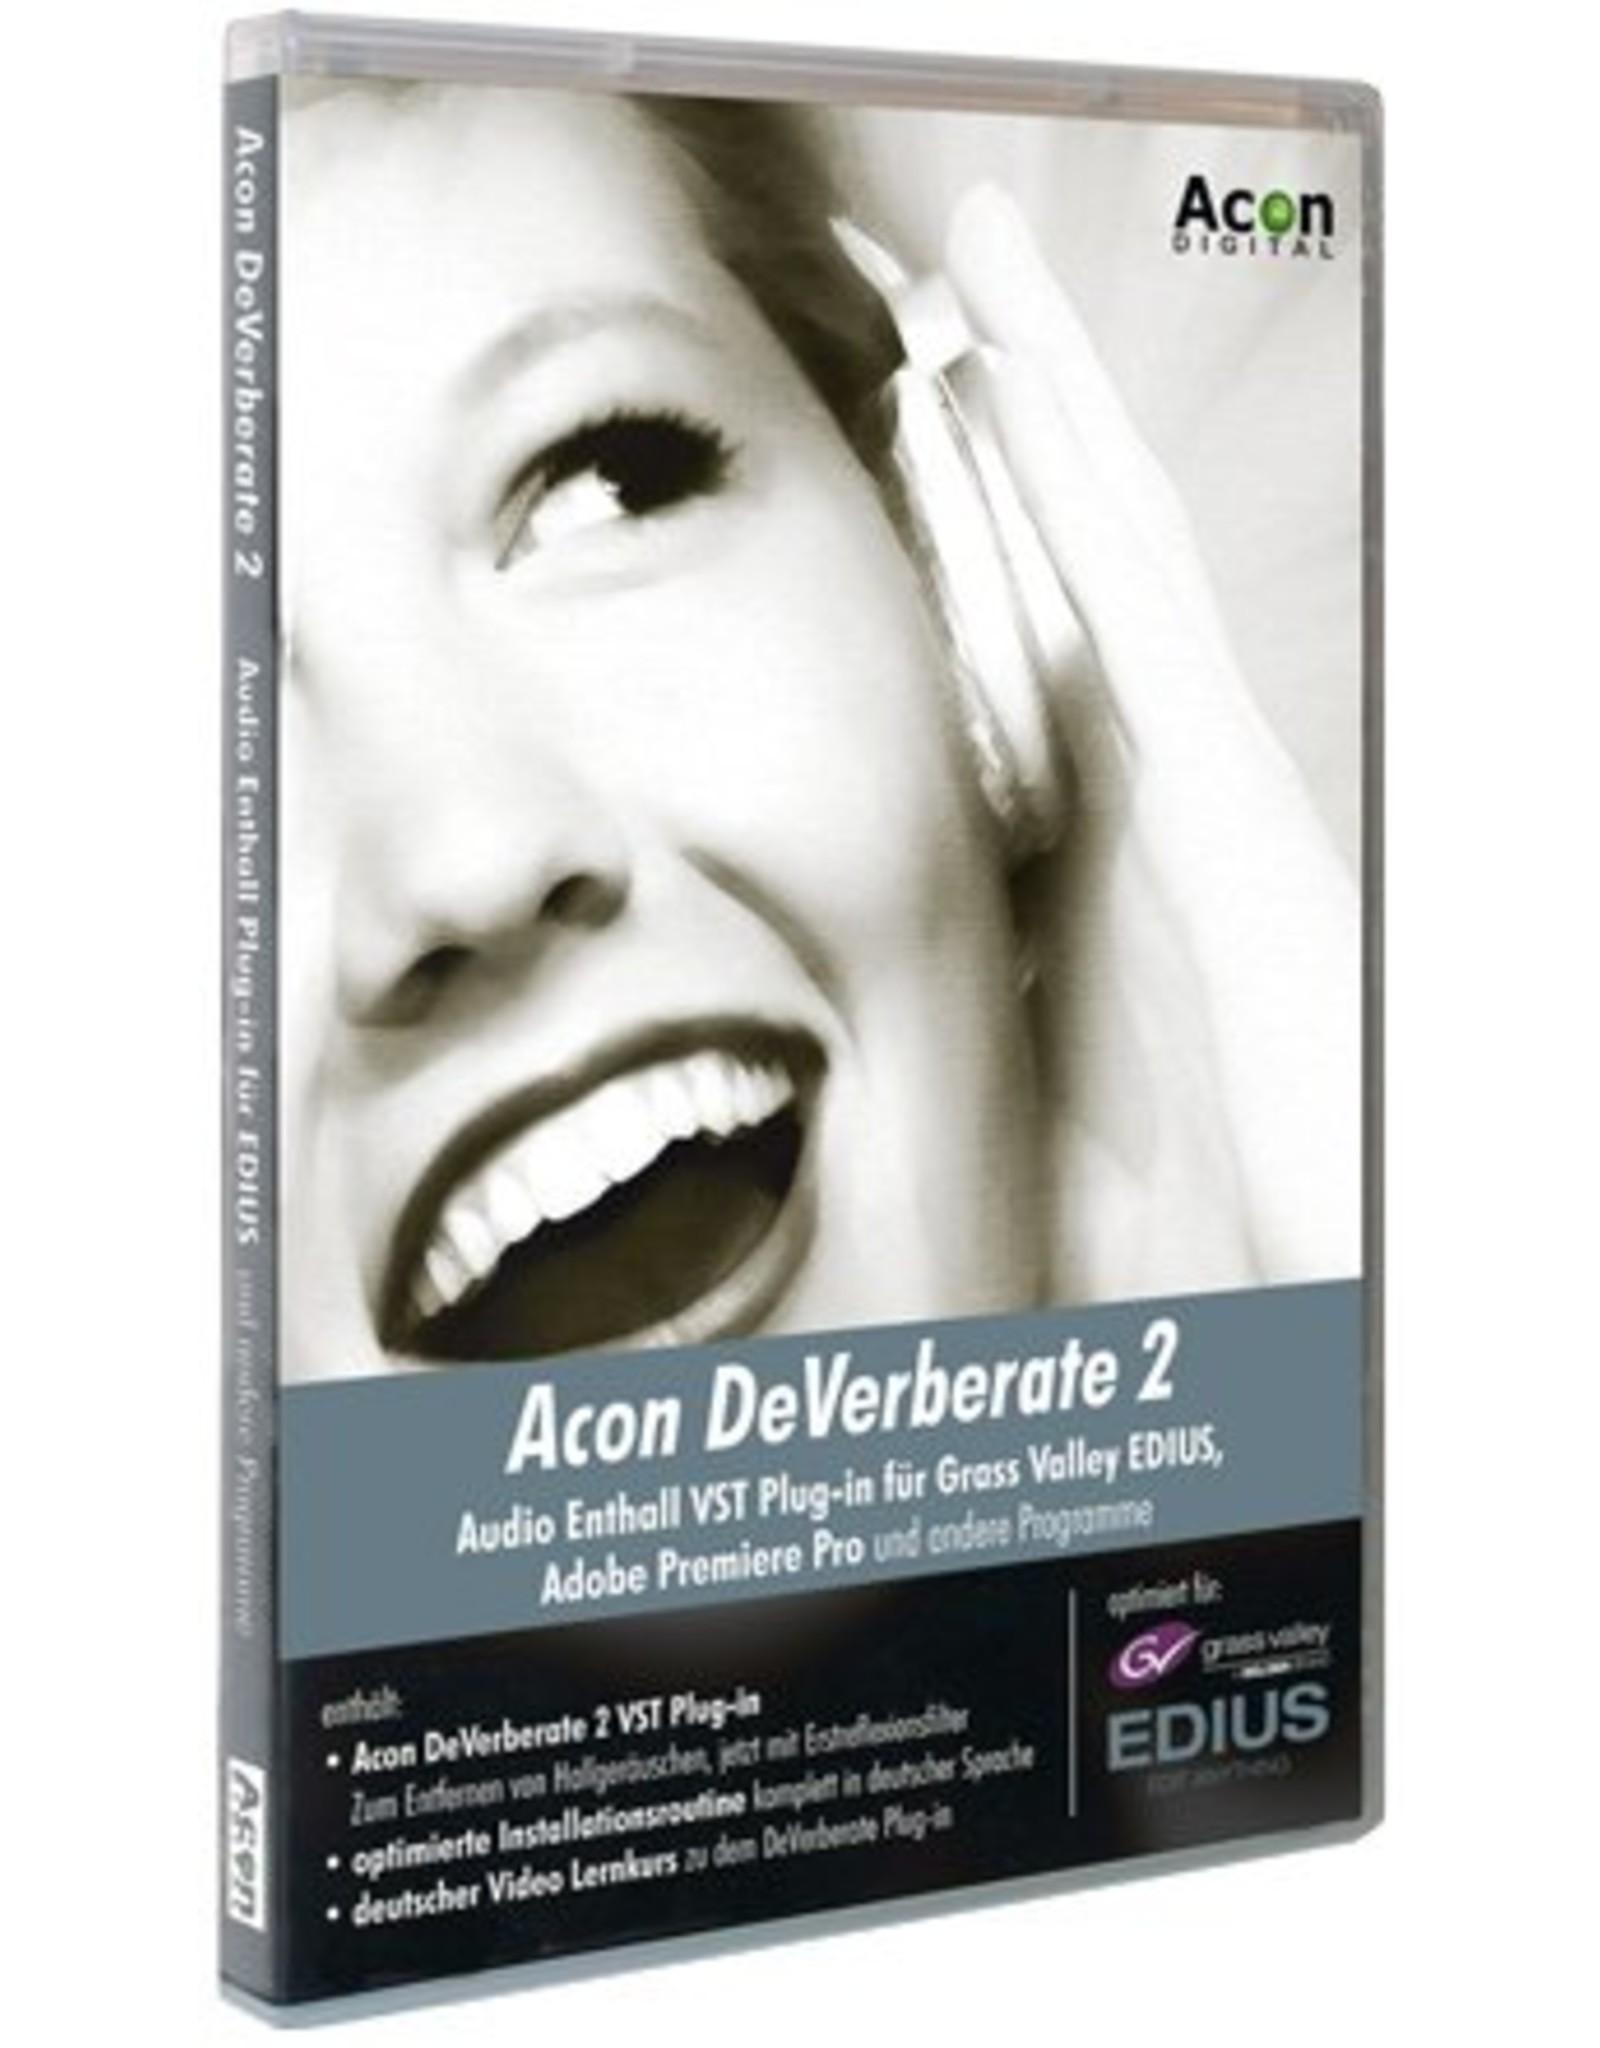 Acon VST Acon Digital Deverberate 2 VST Plug-in for EDIUS